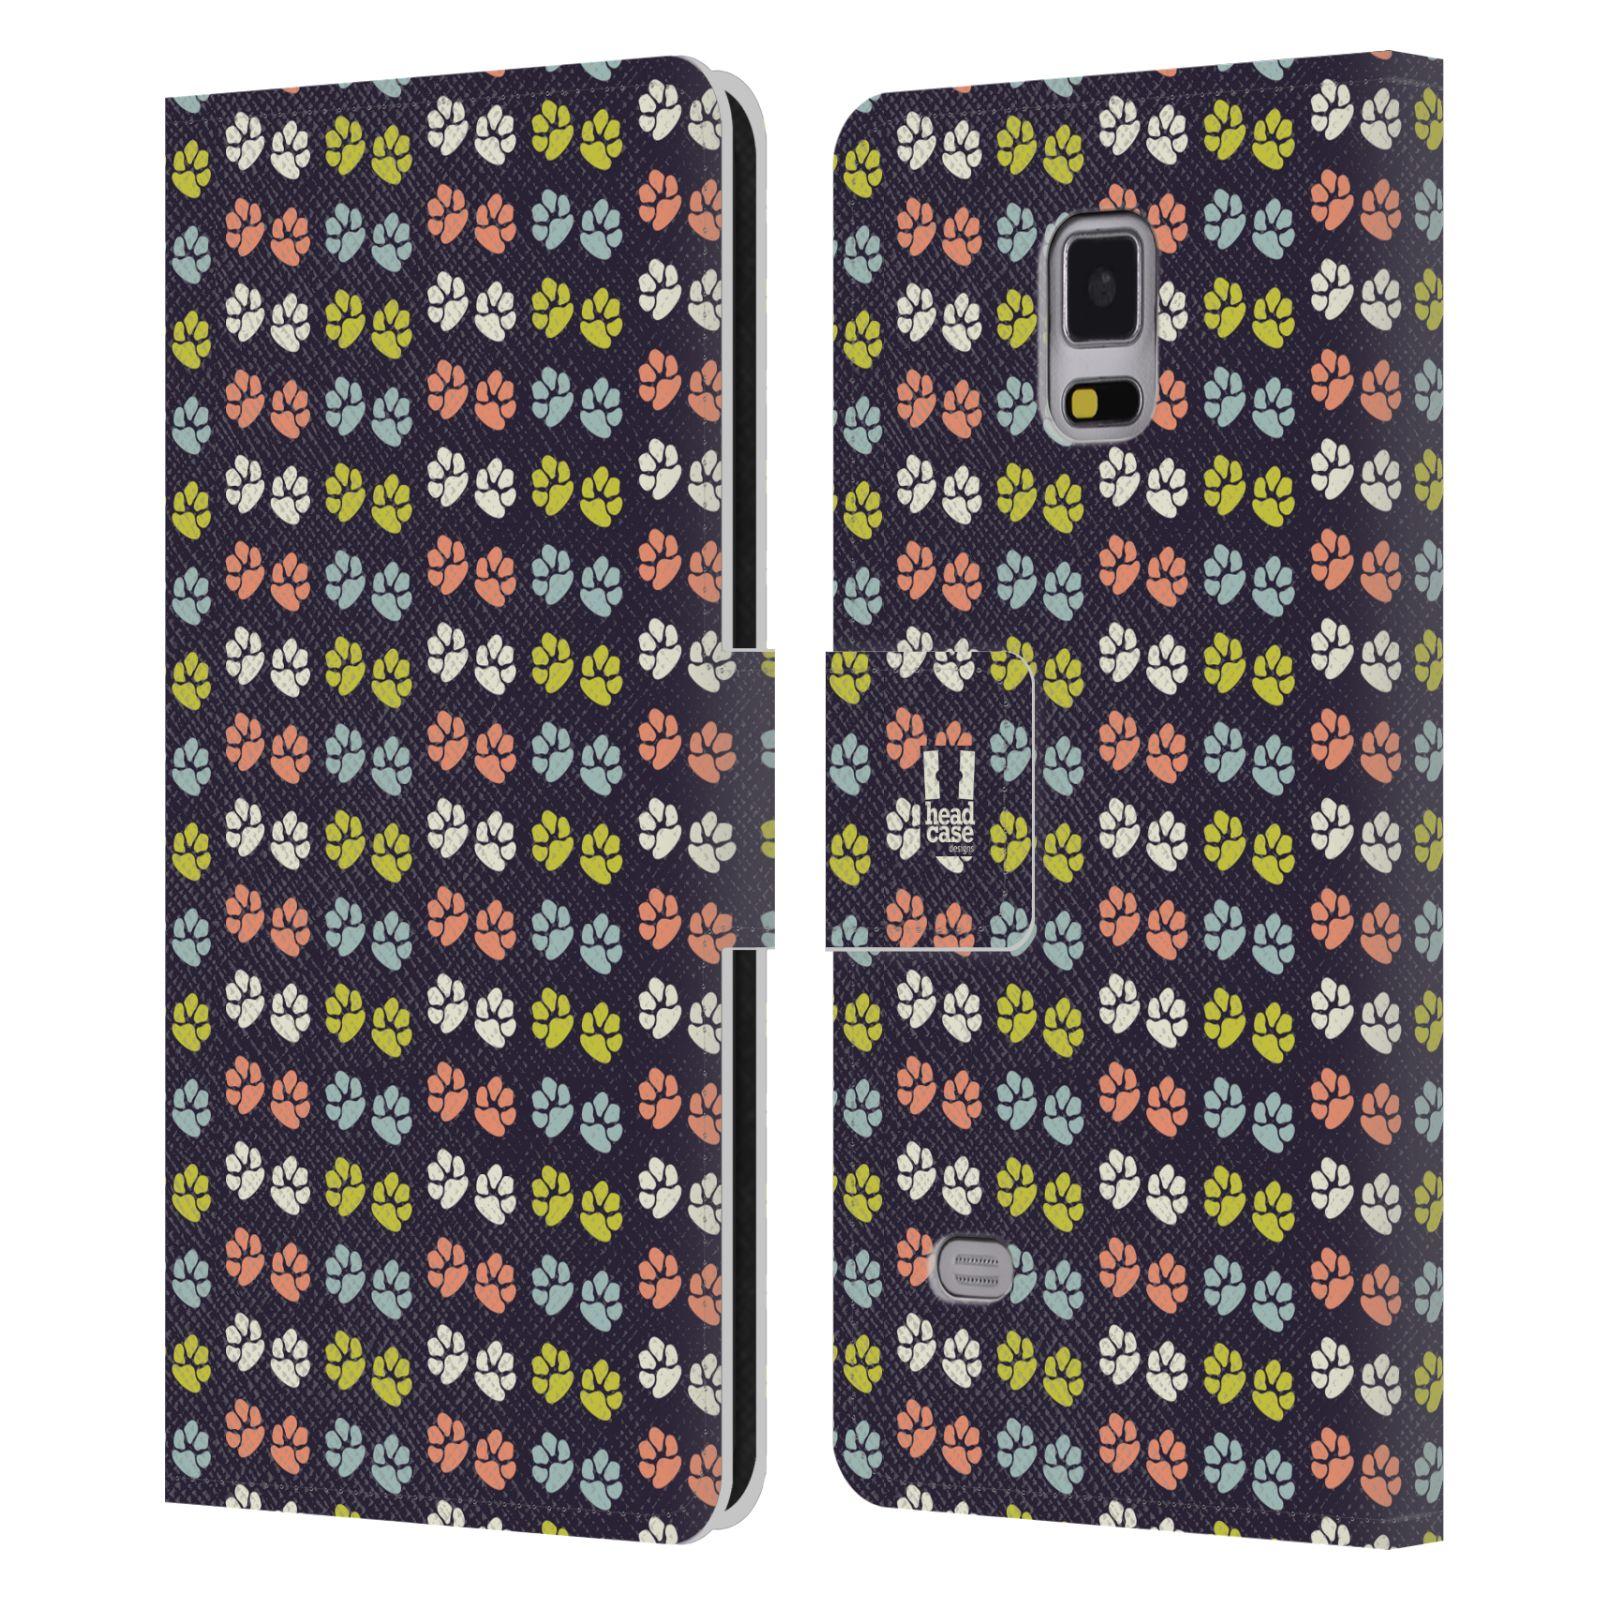 HEAD CASE Flipové pouzdro pro mobil Samsung Galaxy Note 4 Pejsek ťapky barevné RETRO